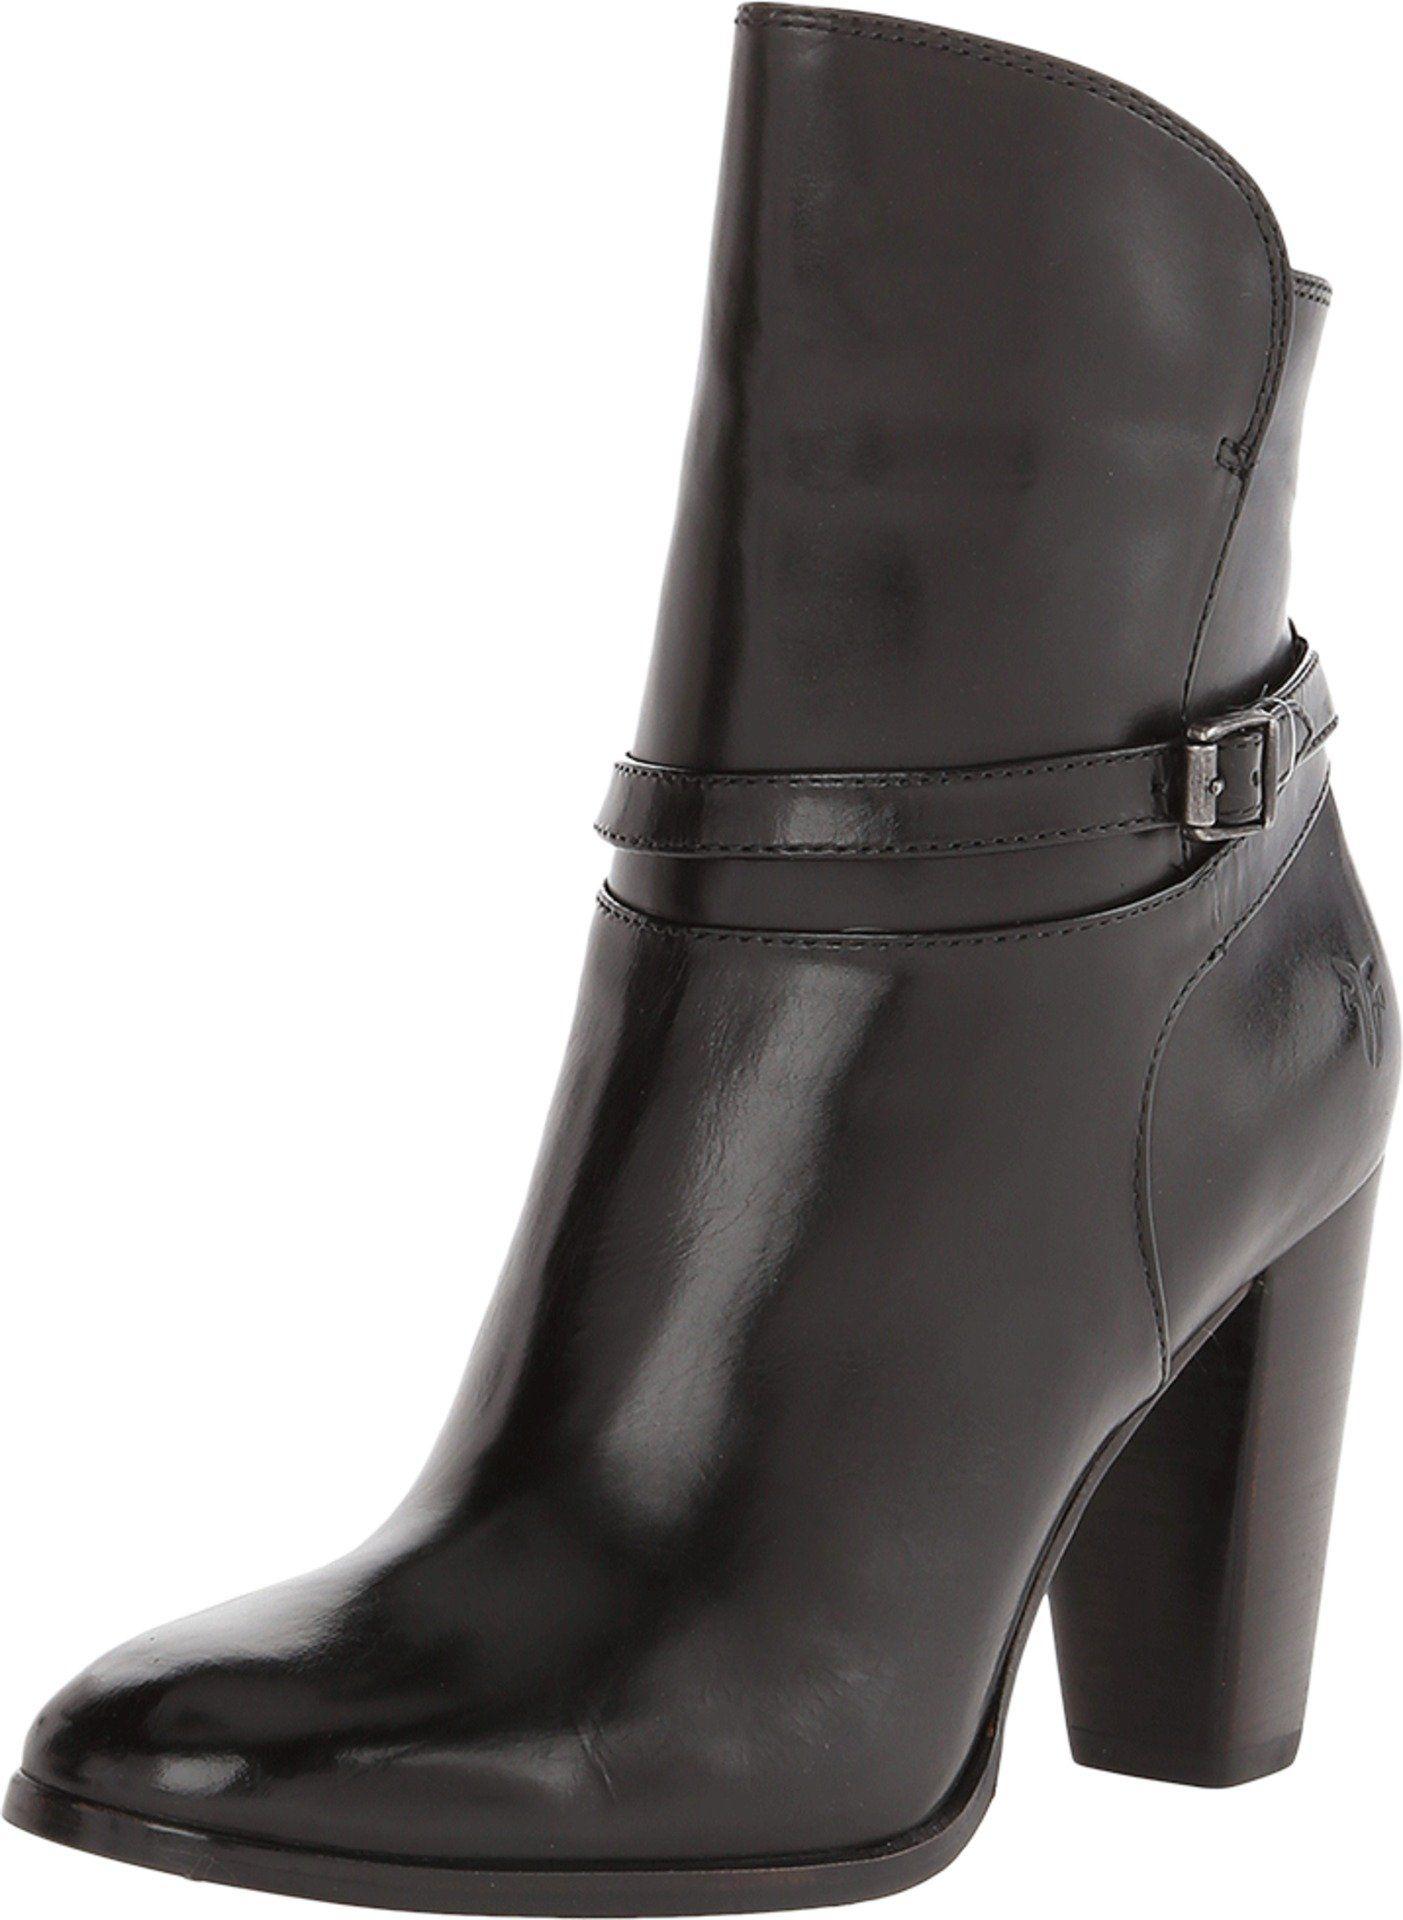 Frye Womens Laurie Zip Short Boot Black Size 6.5. Leather upper. Zip closure. Approx 3.5 inch heel.